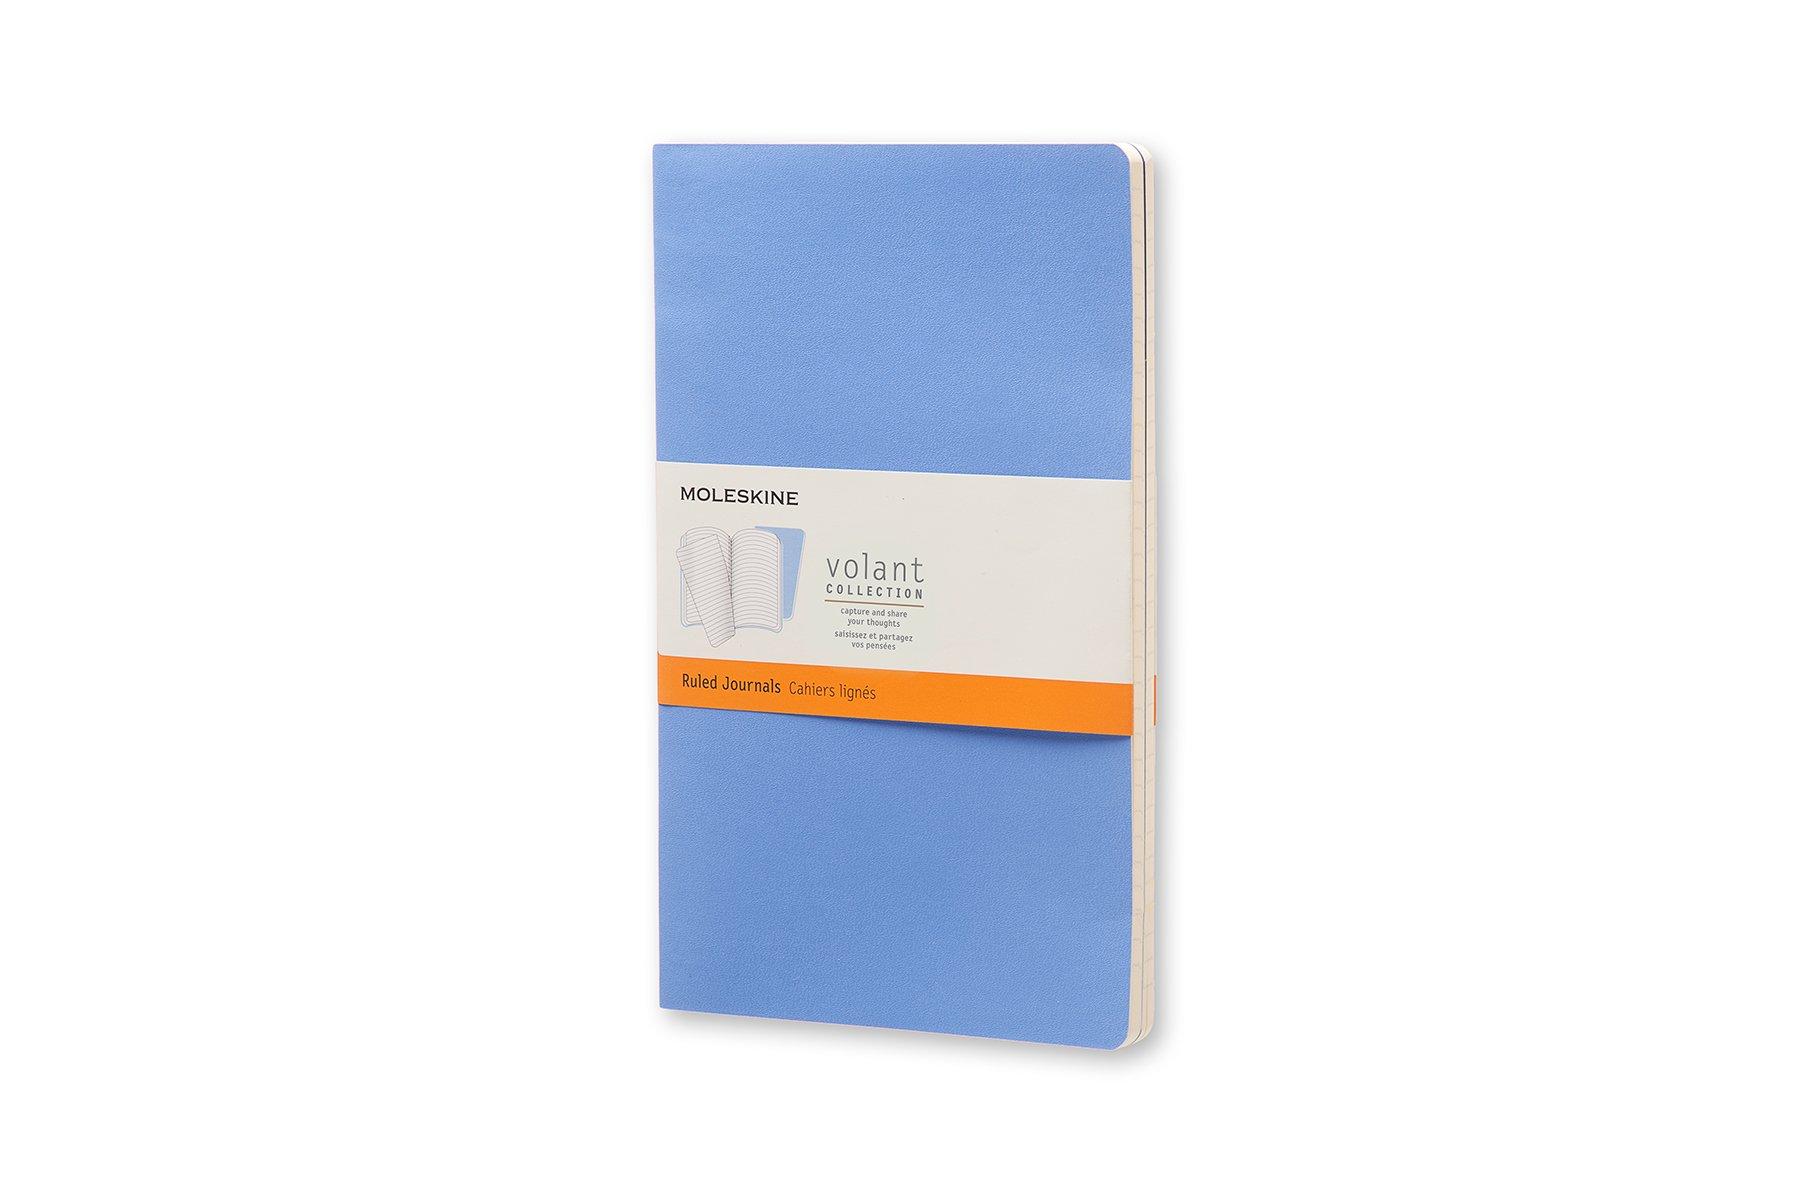 Moleskine Volant Soft Cover Journal, Blue, Ruled, Large x2